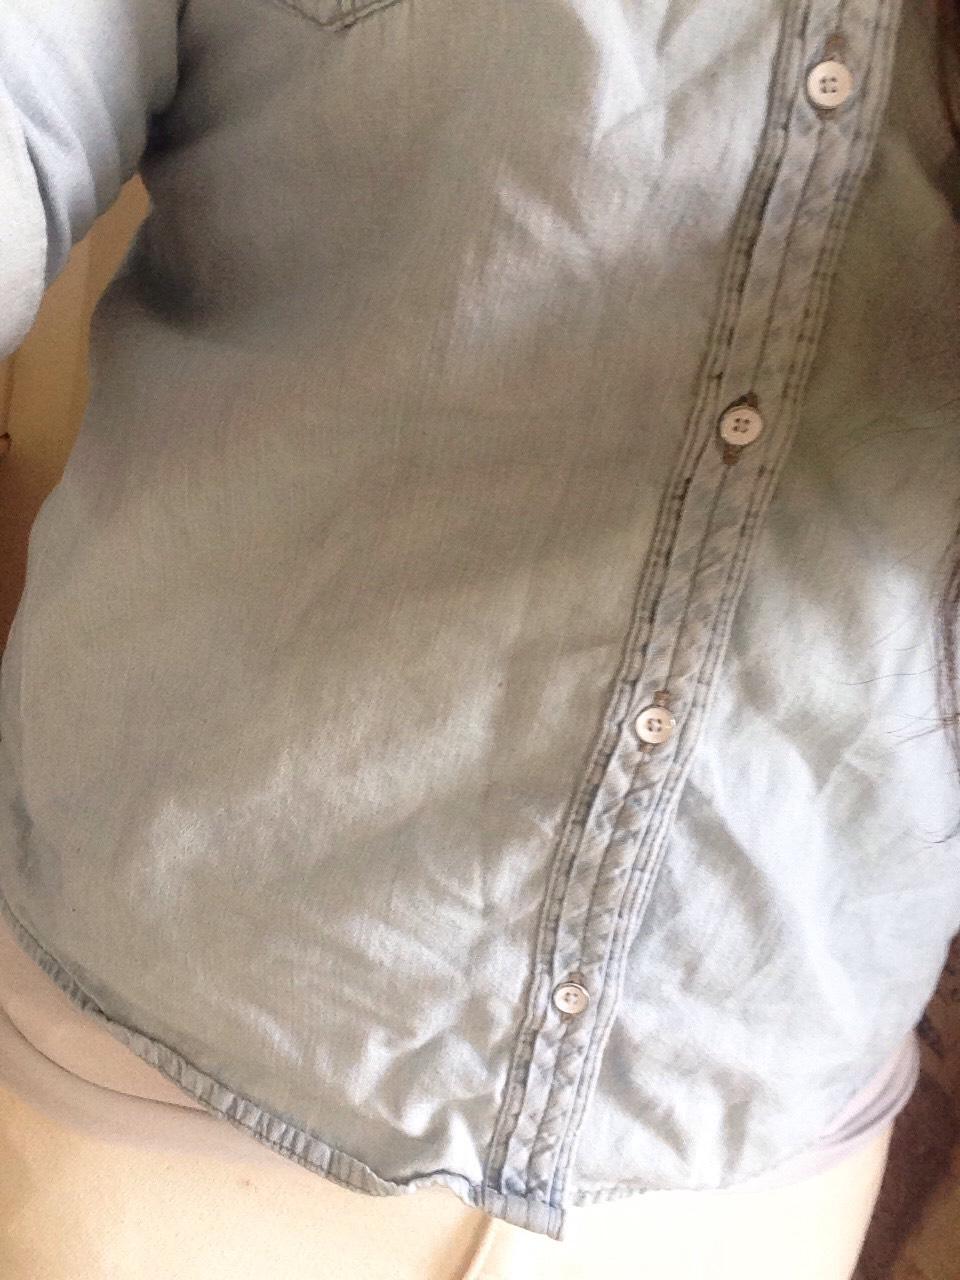 I chose to wear a light wash denim 3/4 sleeve shirt.